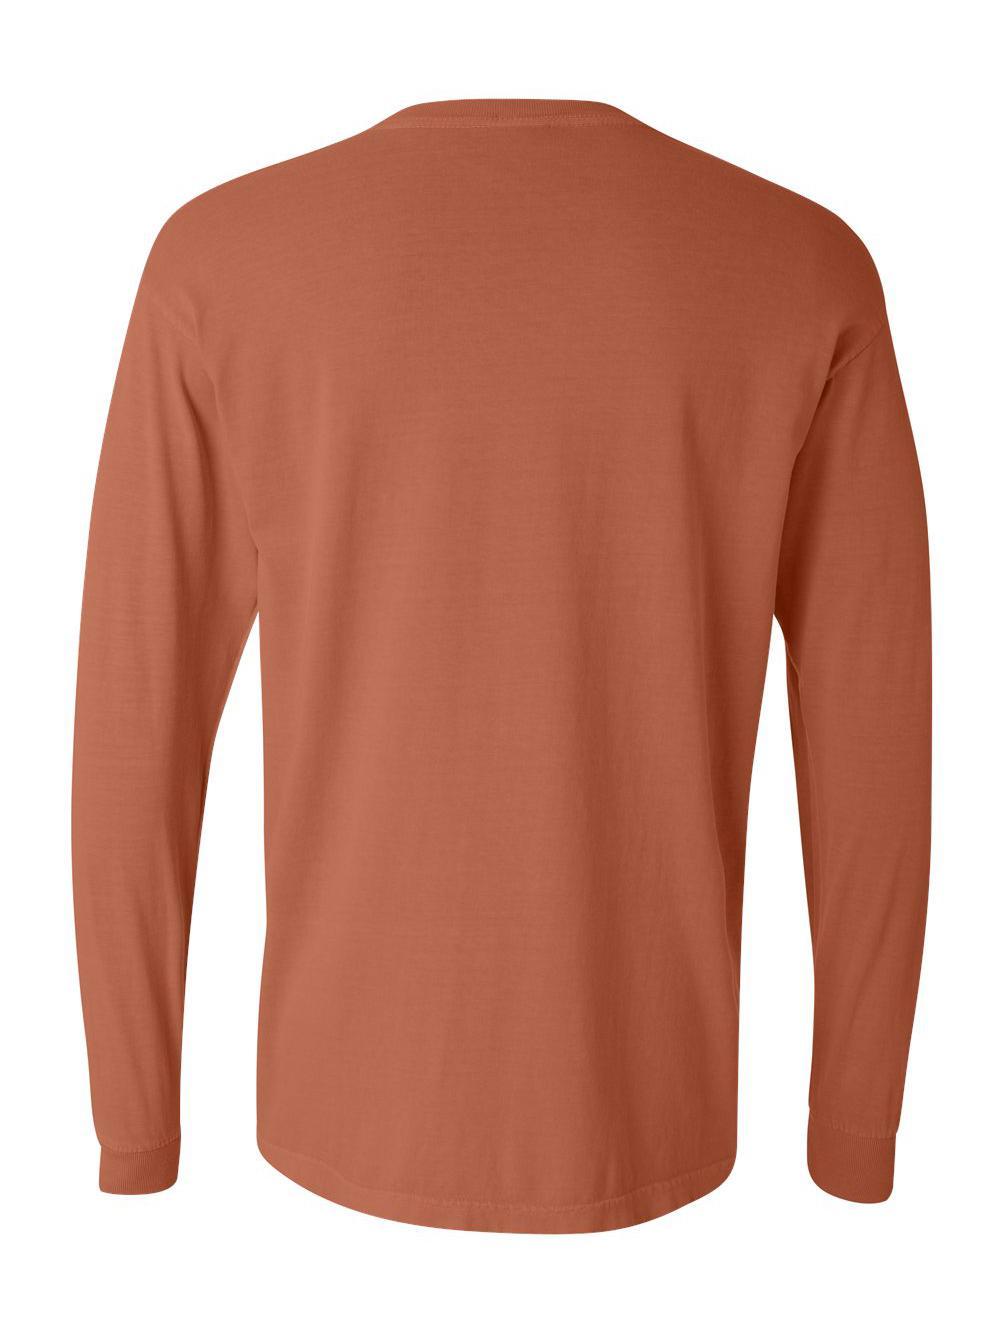 Comfort-Colors-Garment-Dyed-Heavyweight-Ringspun-Long-Sleeve-T-Shirt-6014 thumbnail 76